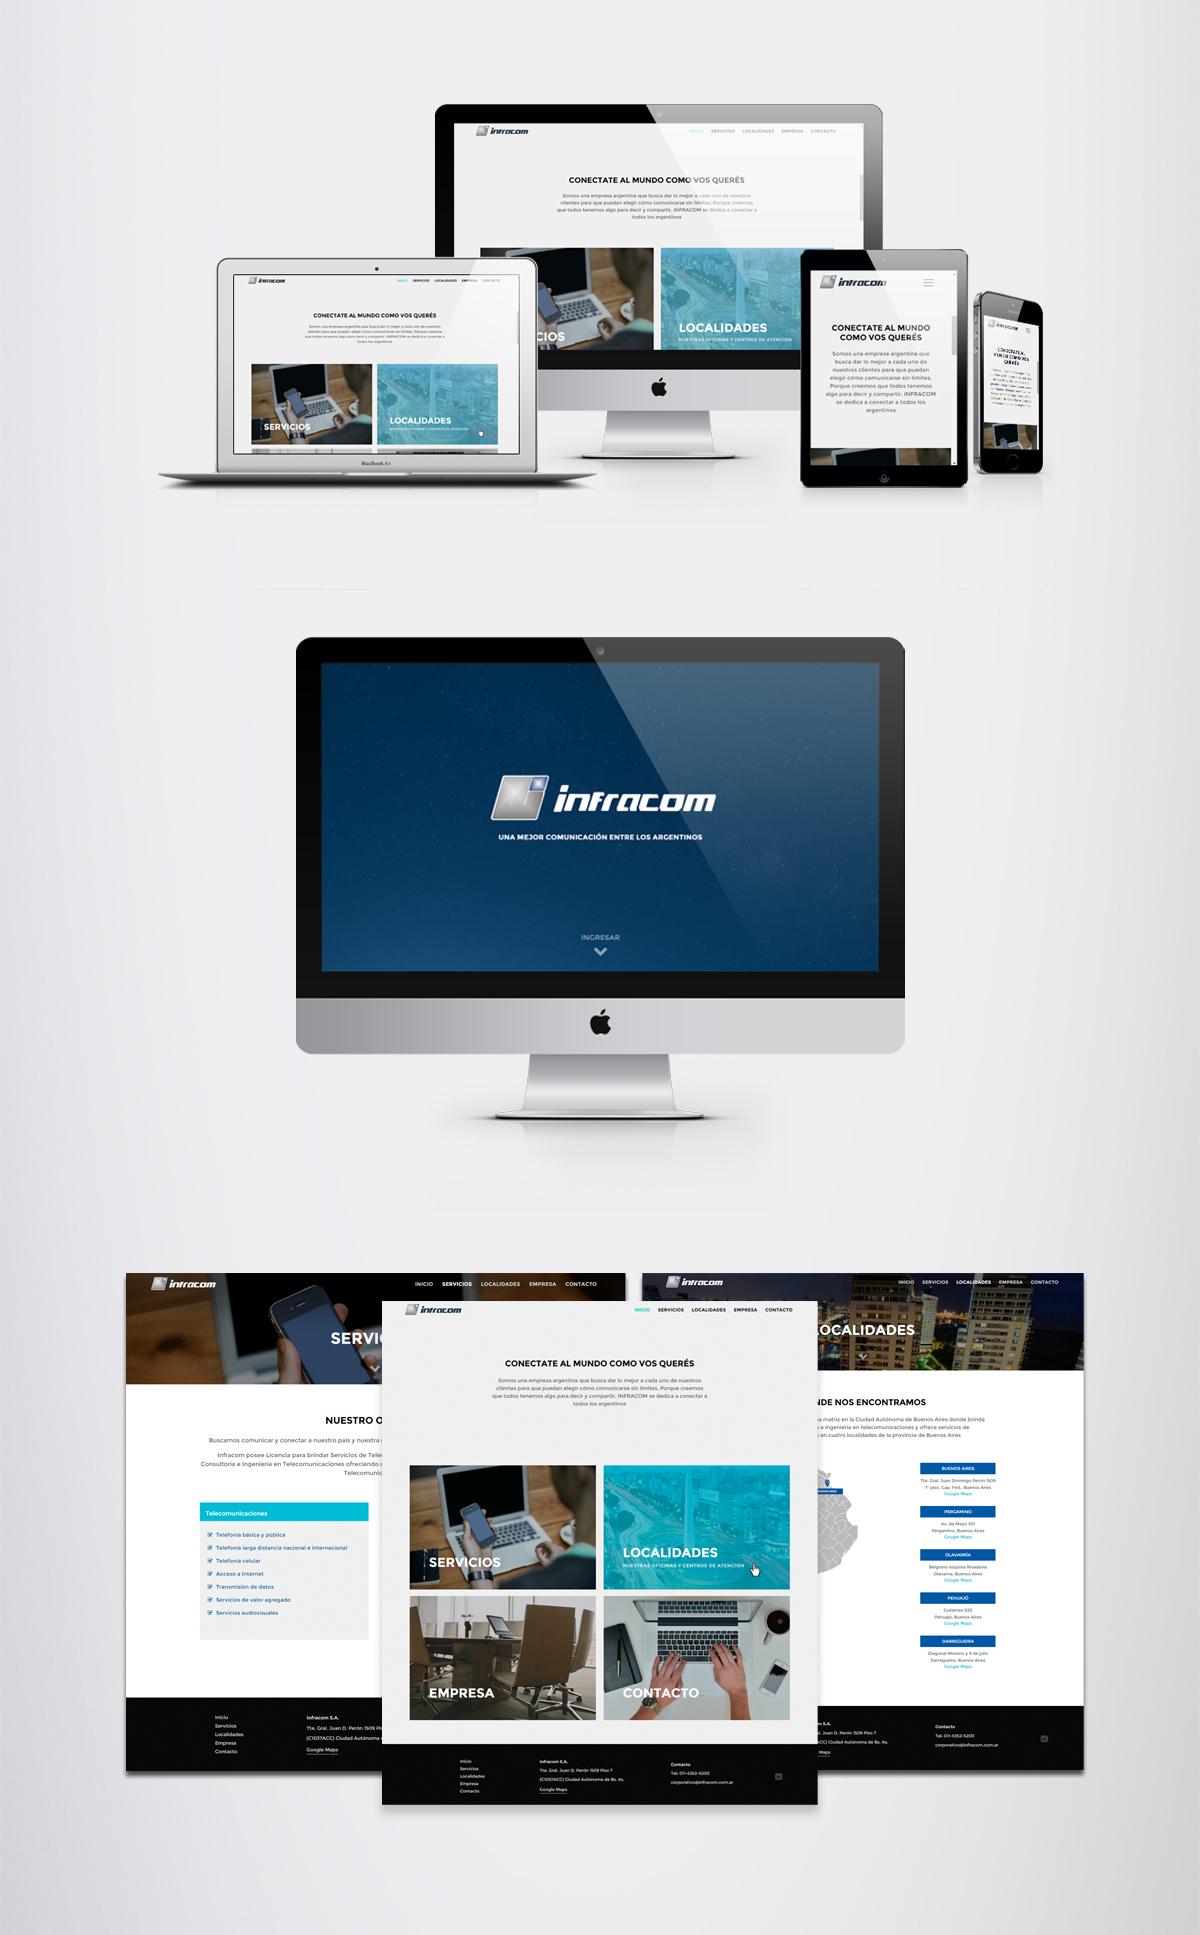 Web design Website css html5 JavaScript